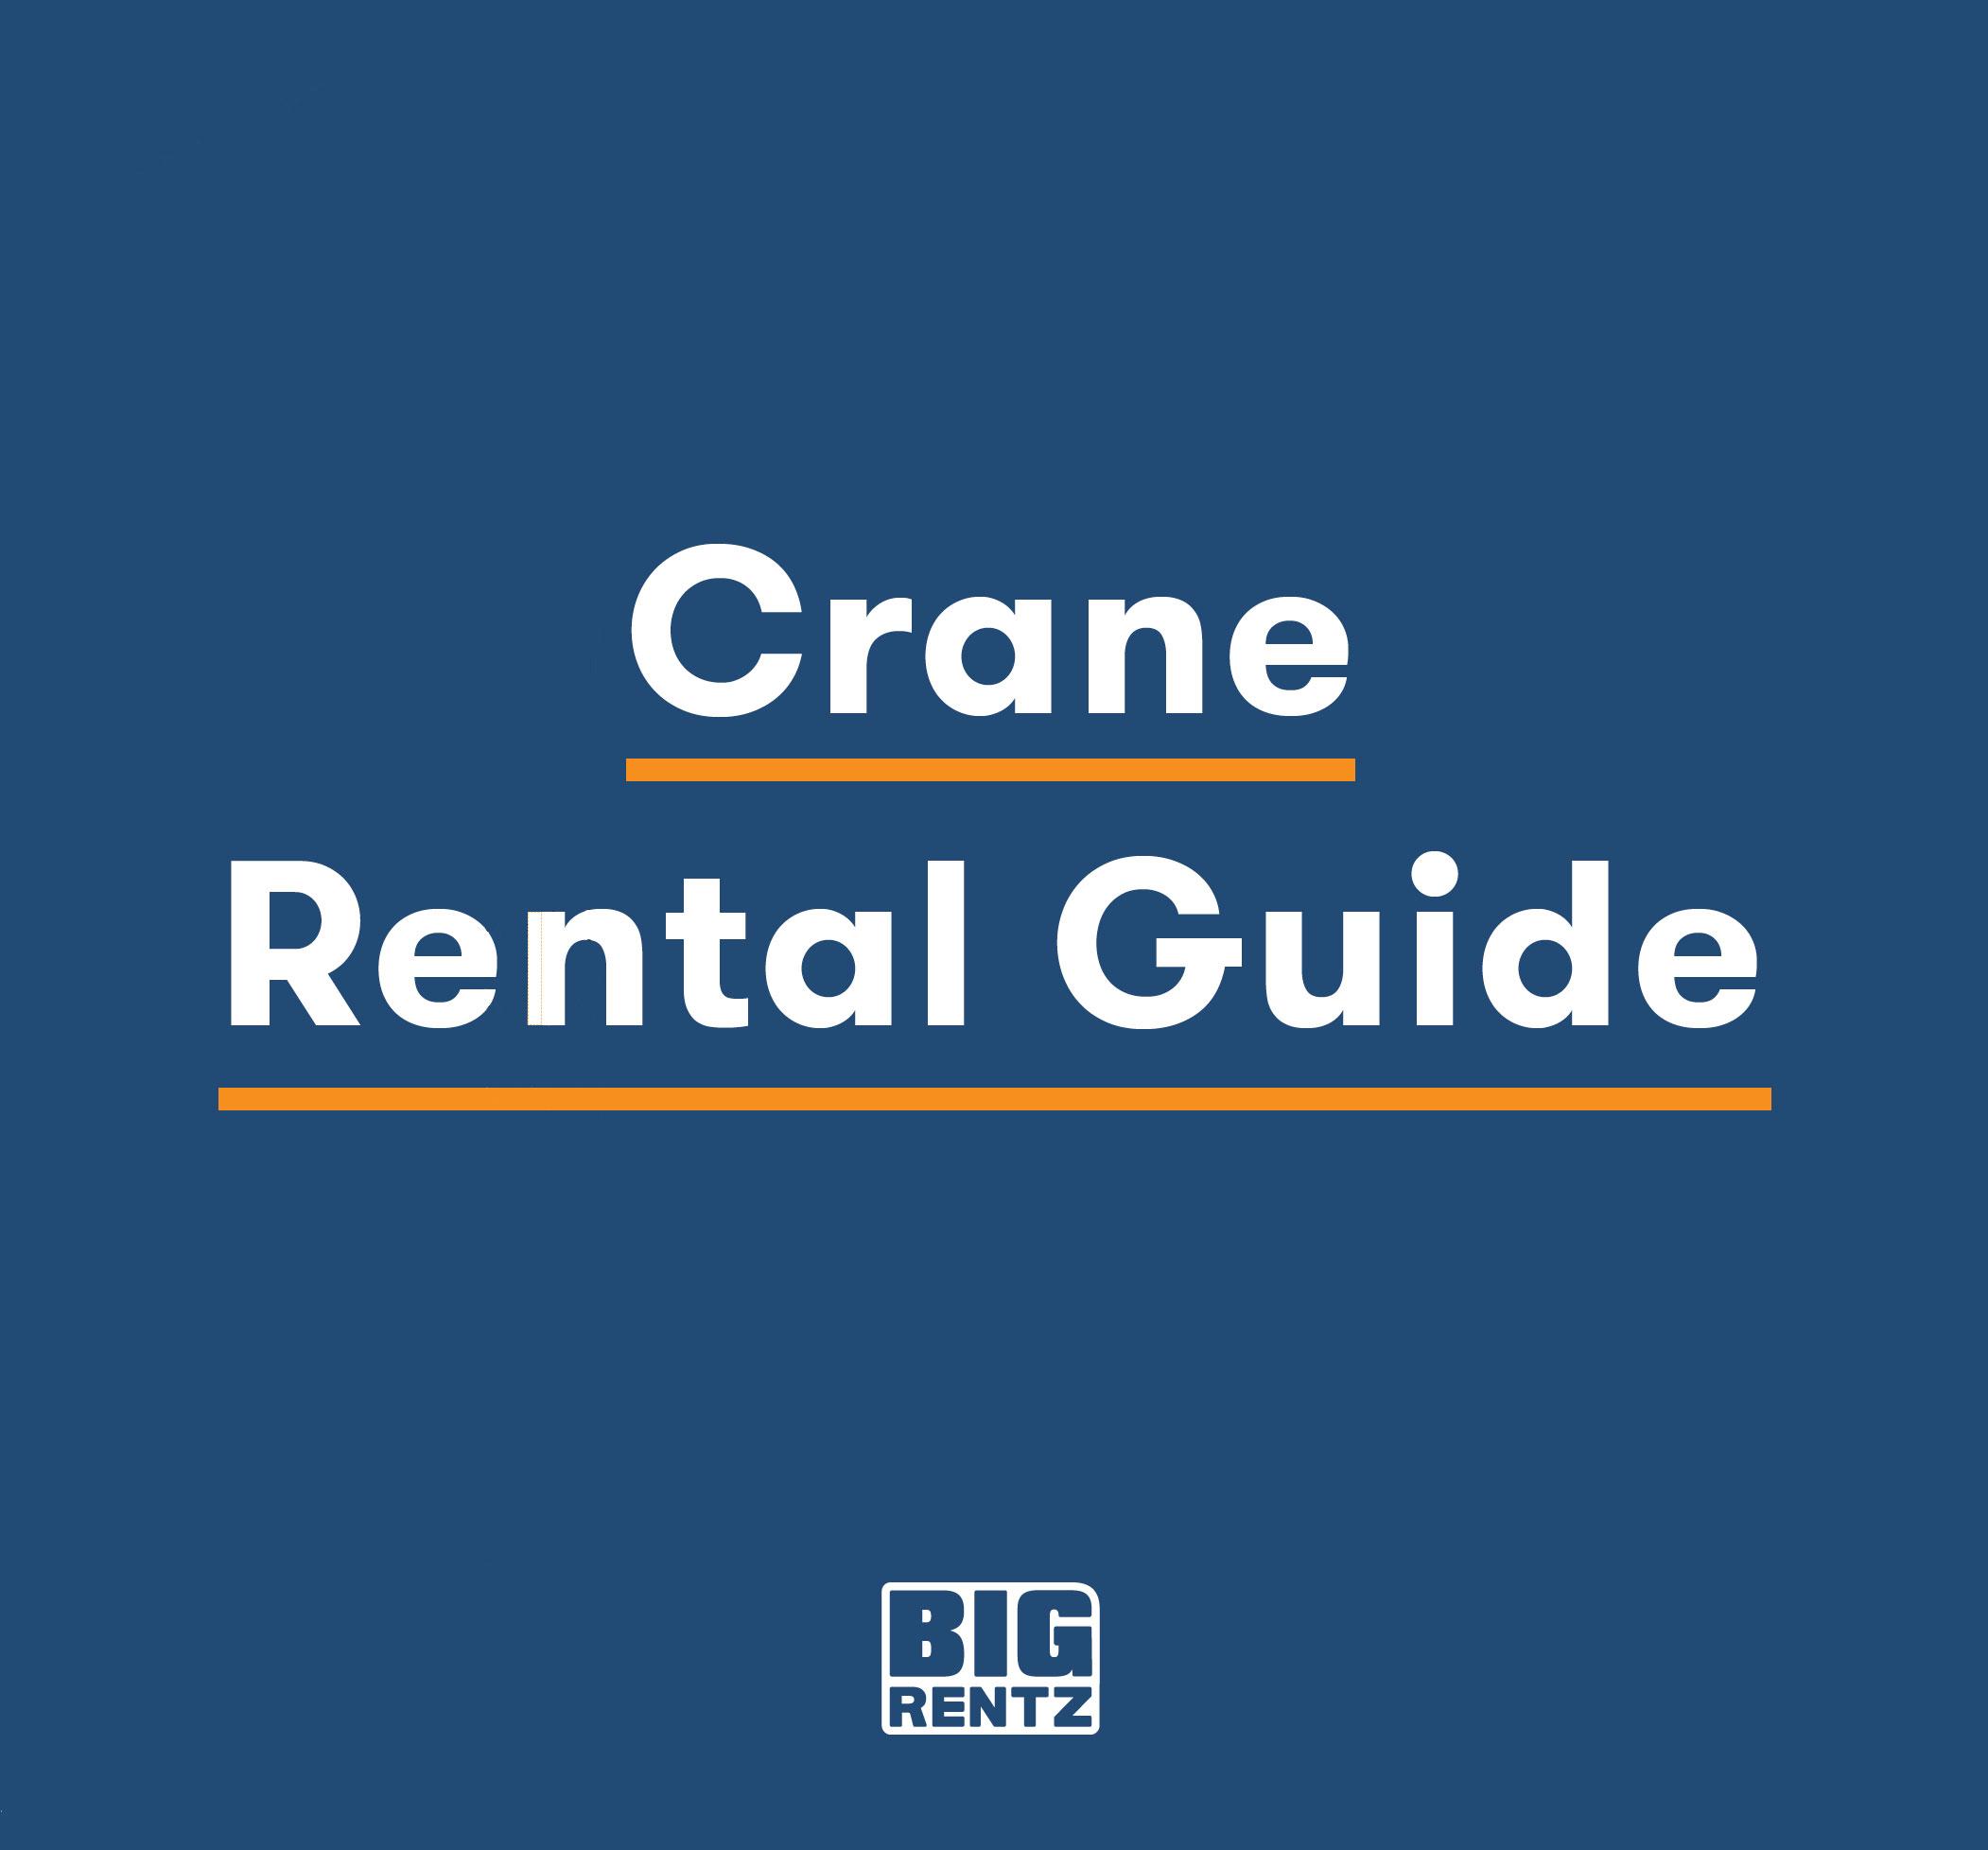 Crane Rental Guide